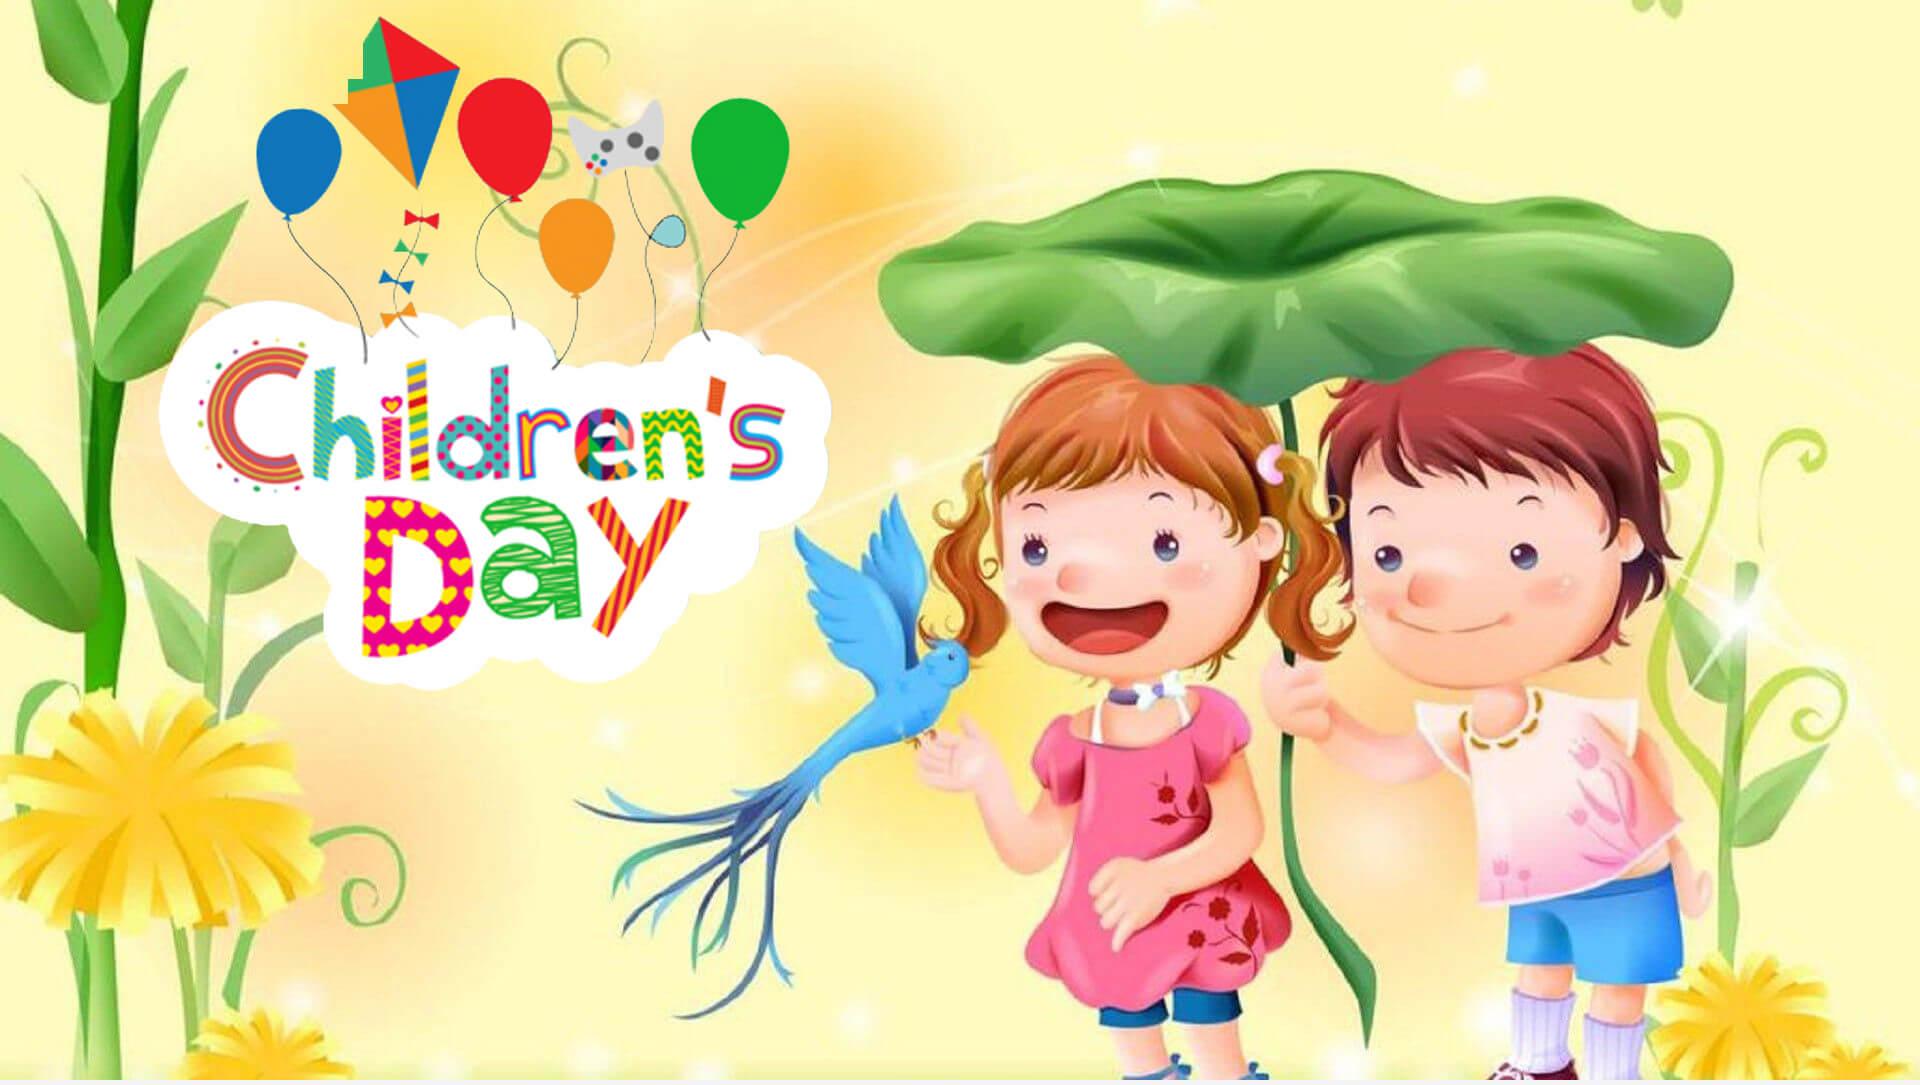 international childrens day hd cartoon wallpaper